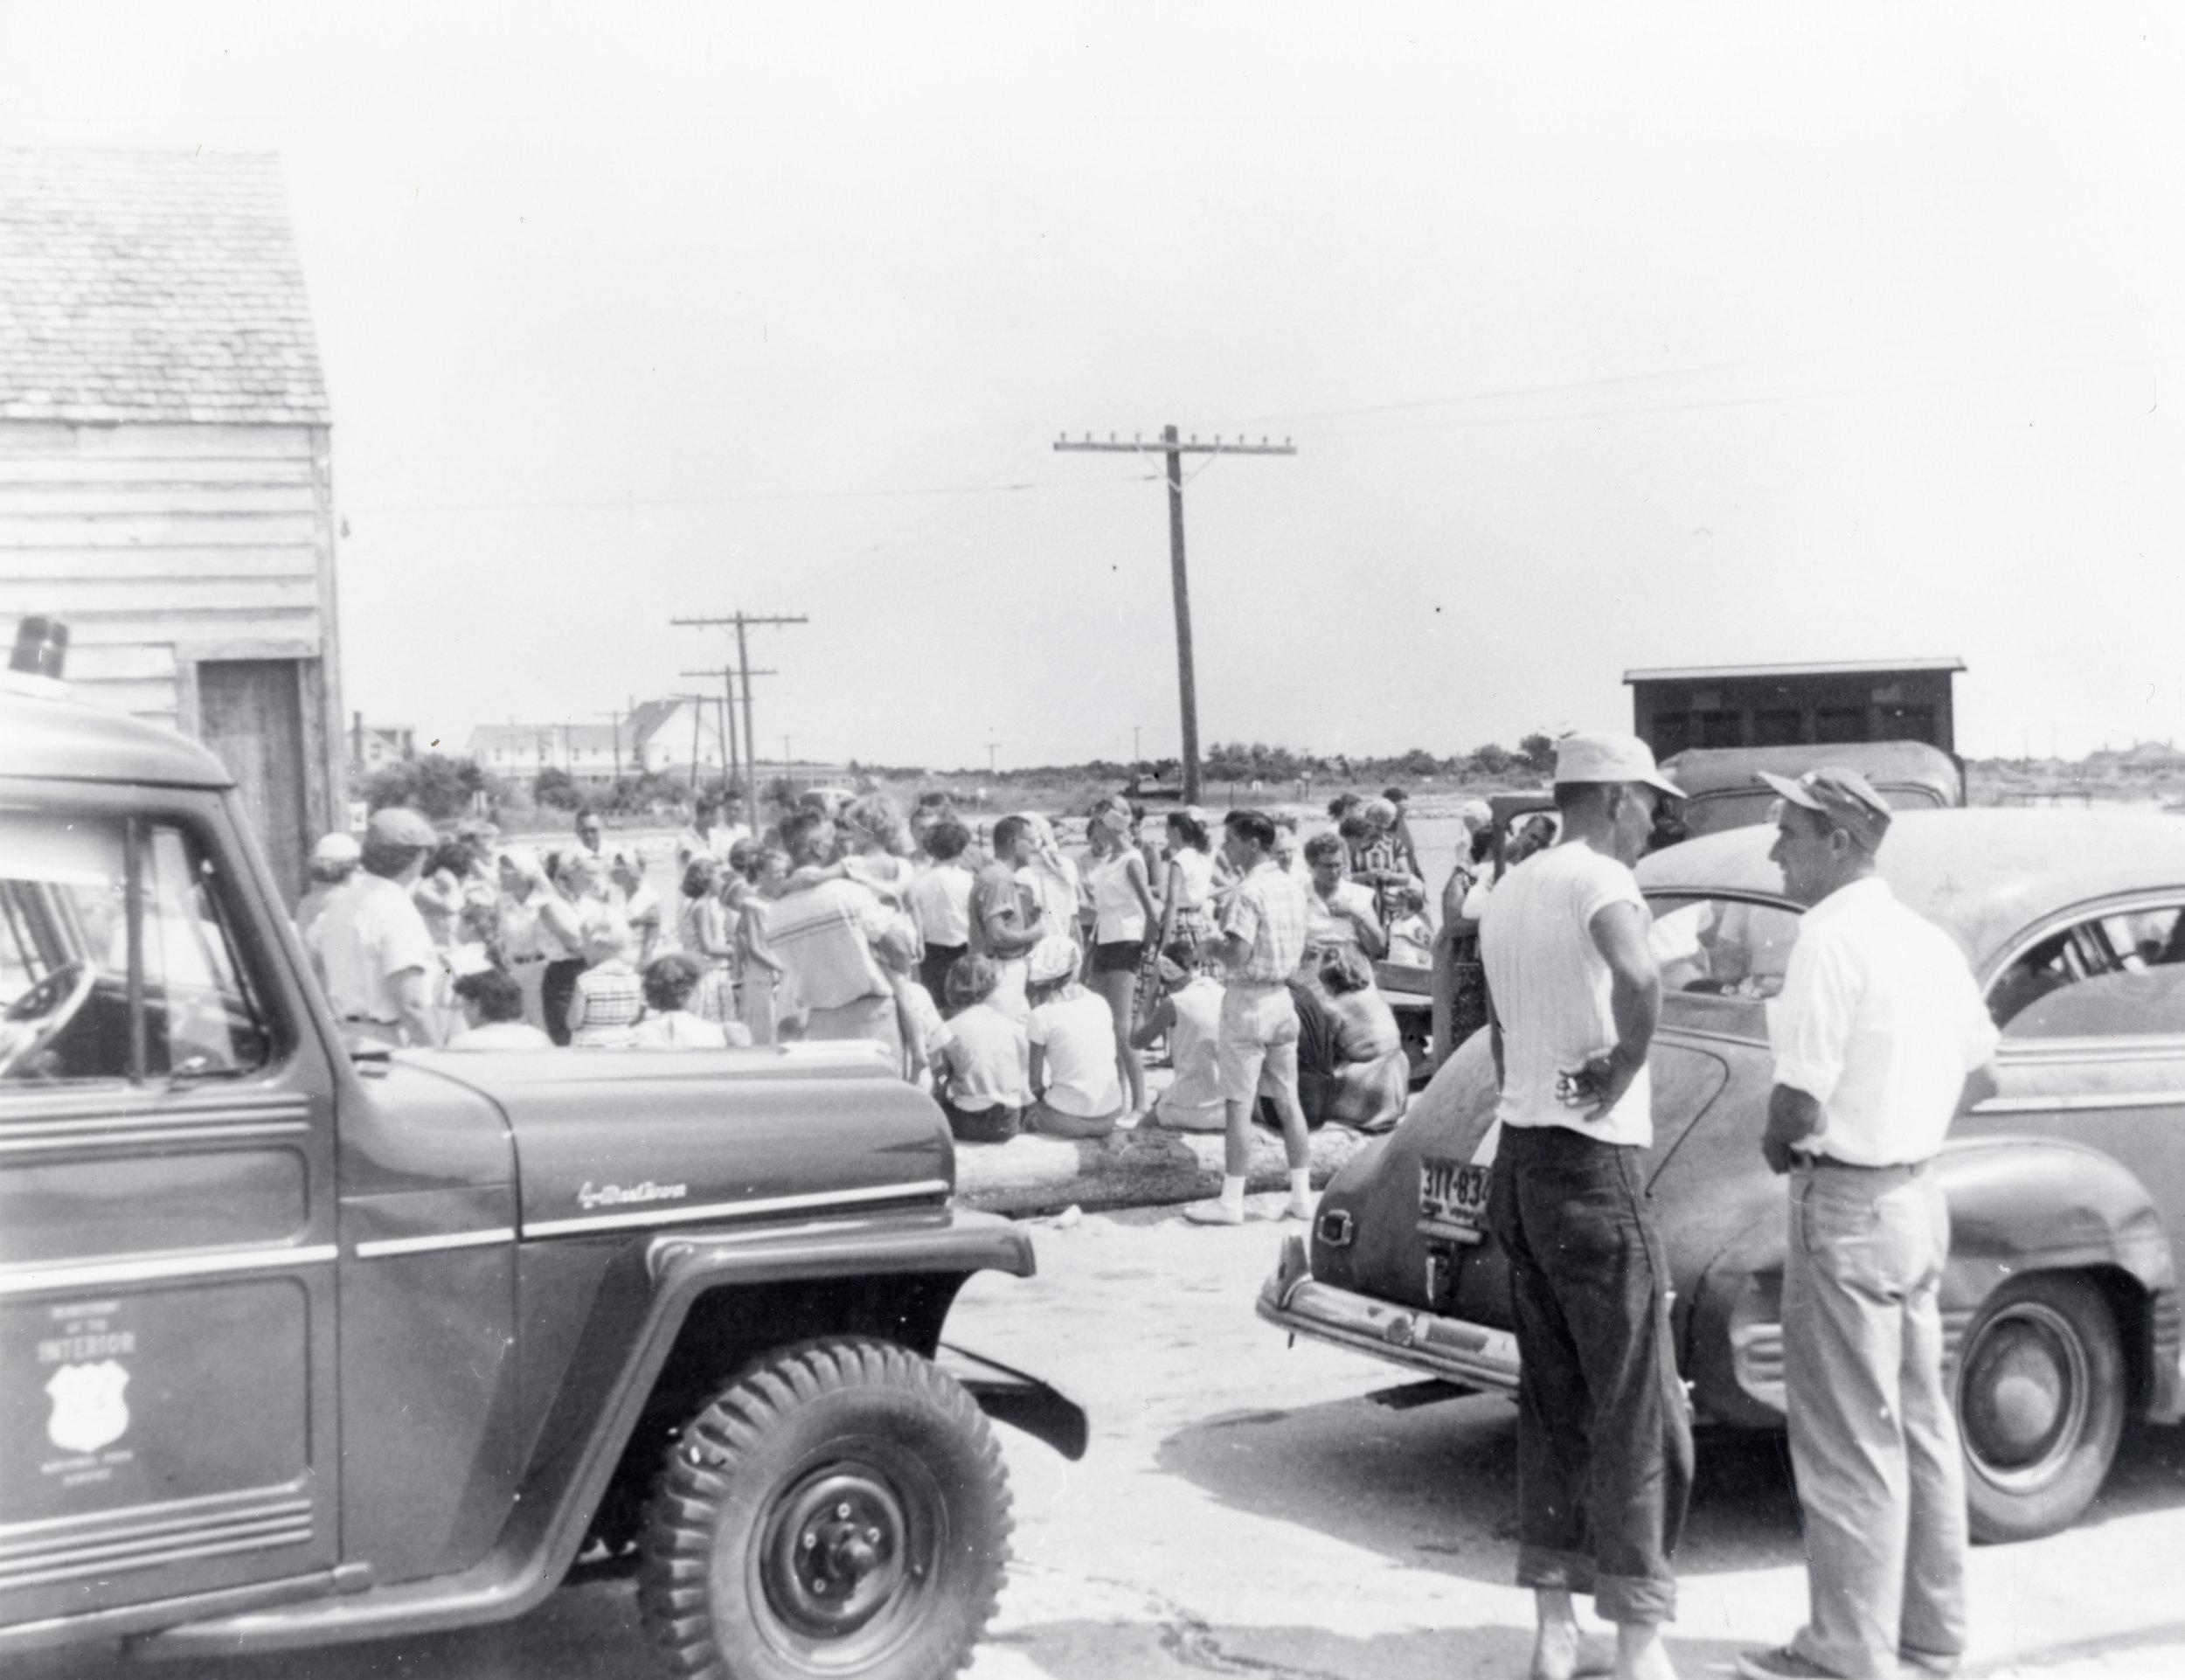 Mailboat Dock, Ocracoke, July 5, 1957